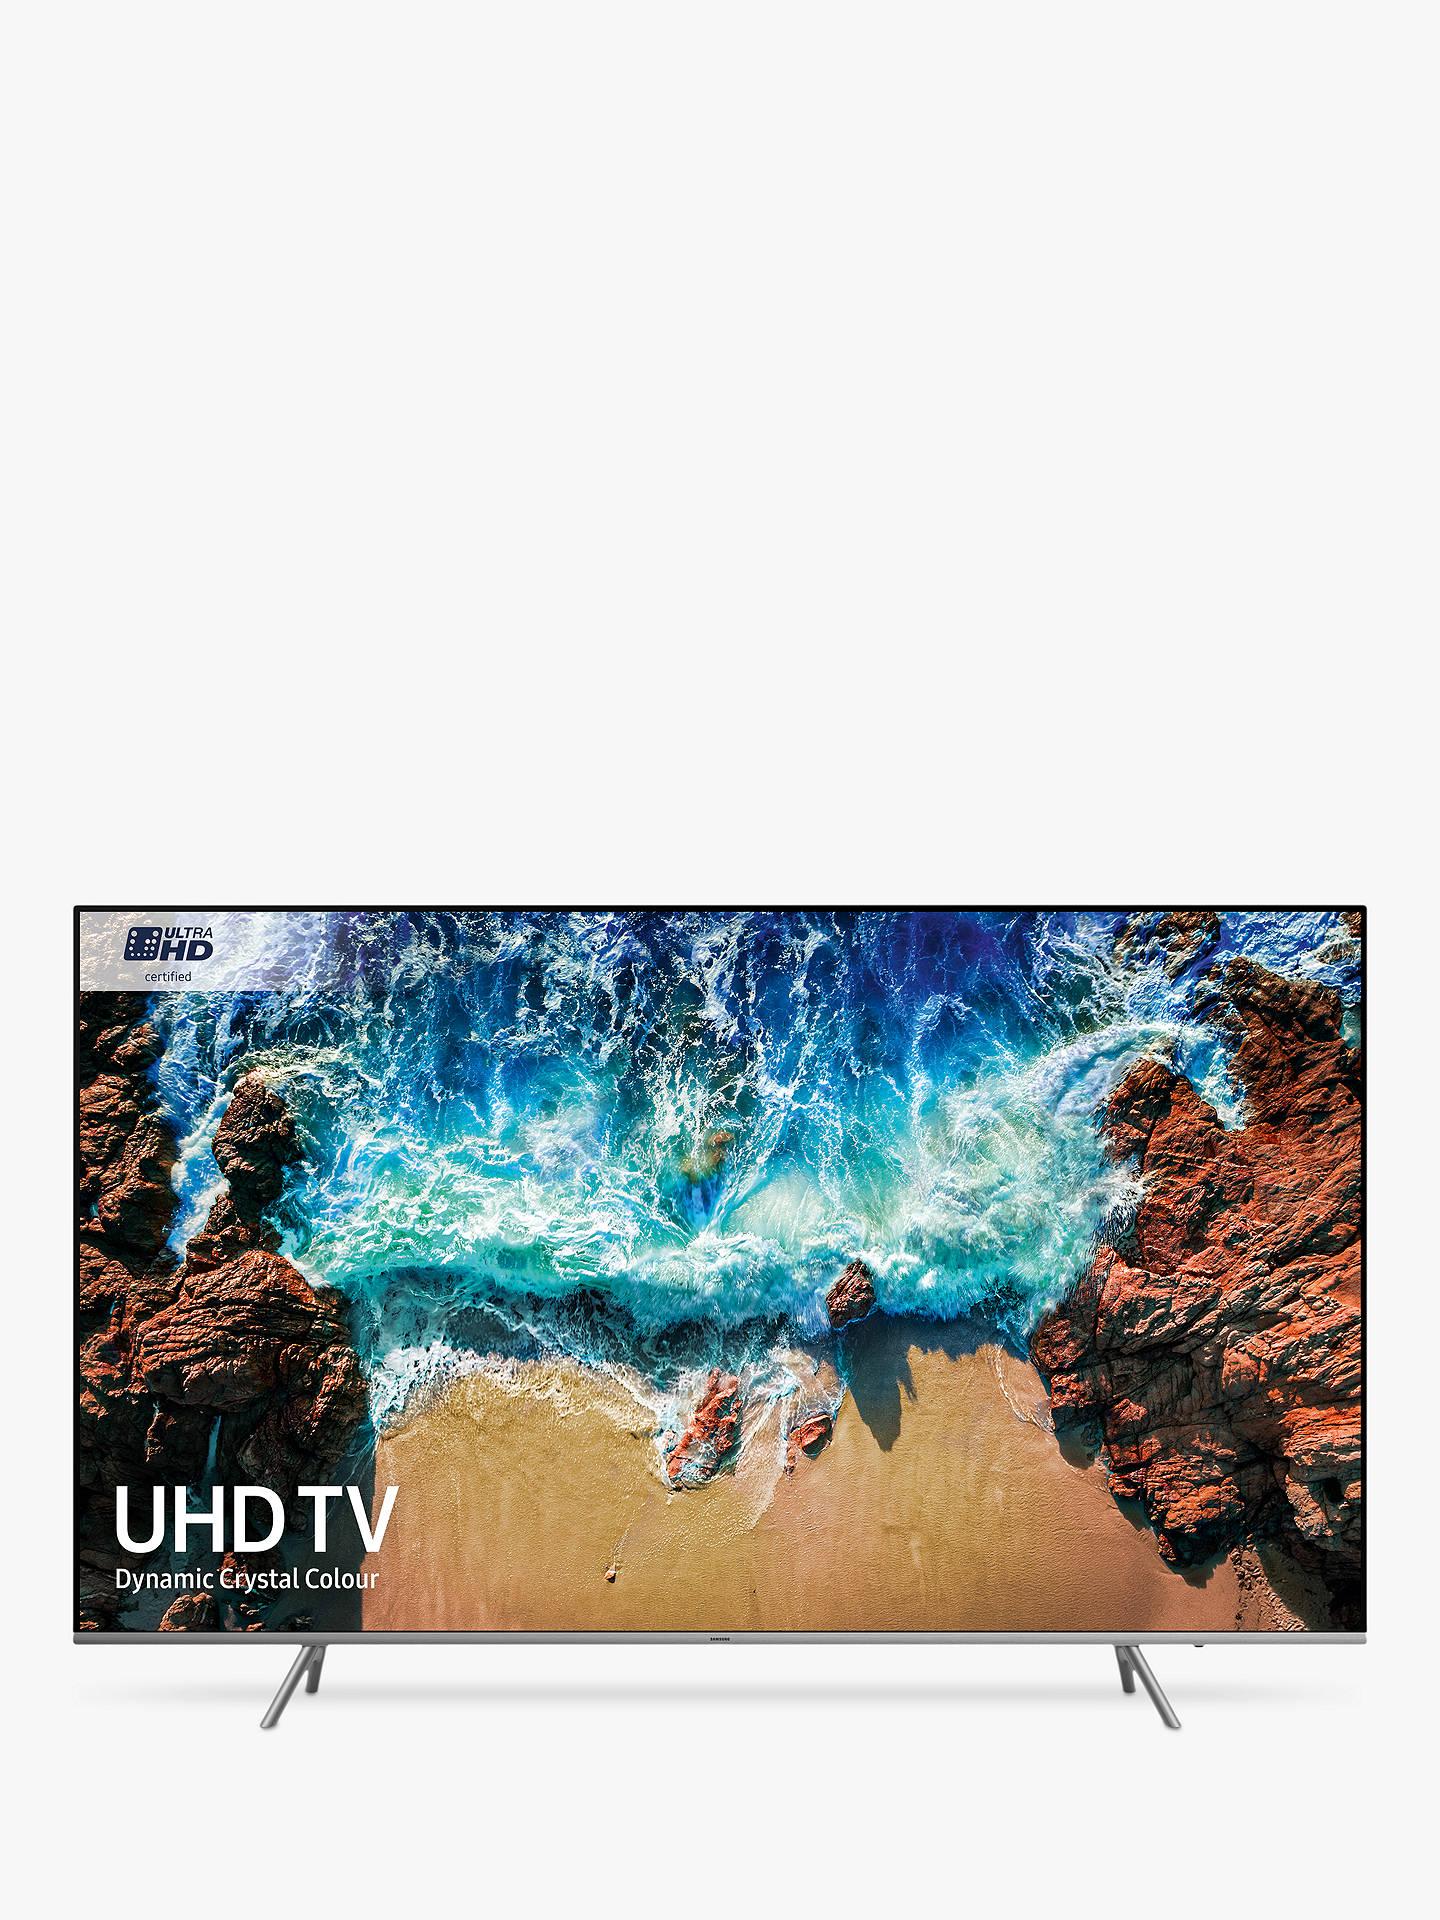 74b7a4e1f Buy Samsung UE82NU8000 HDR Extreme 4K Ultra HD Smart TV